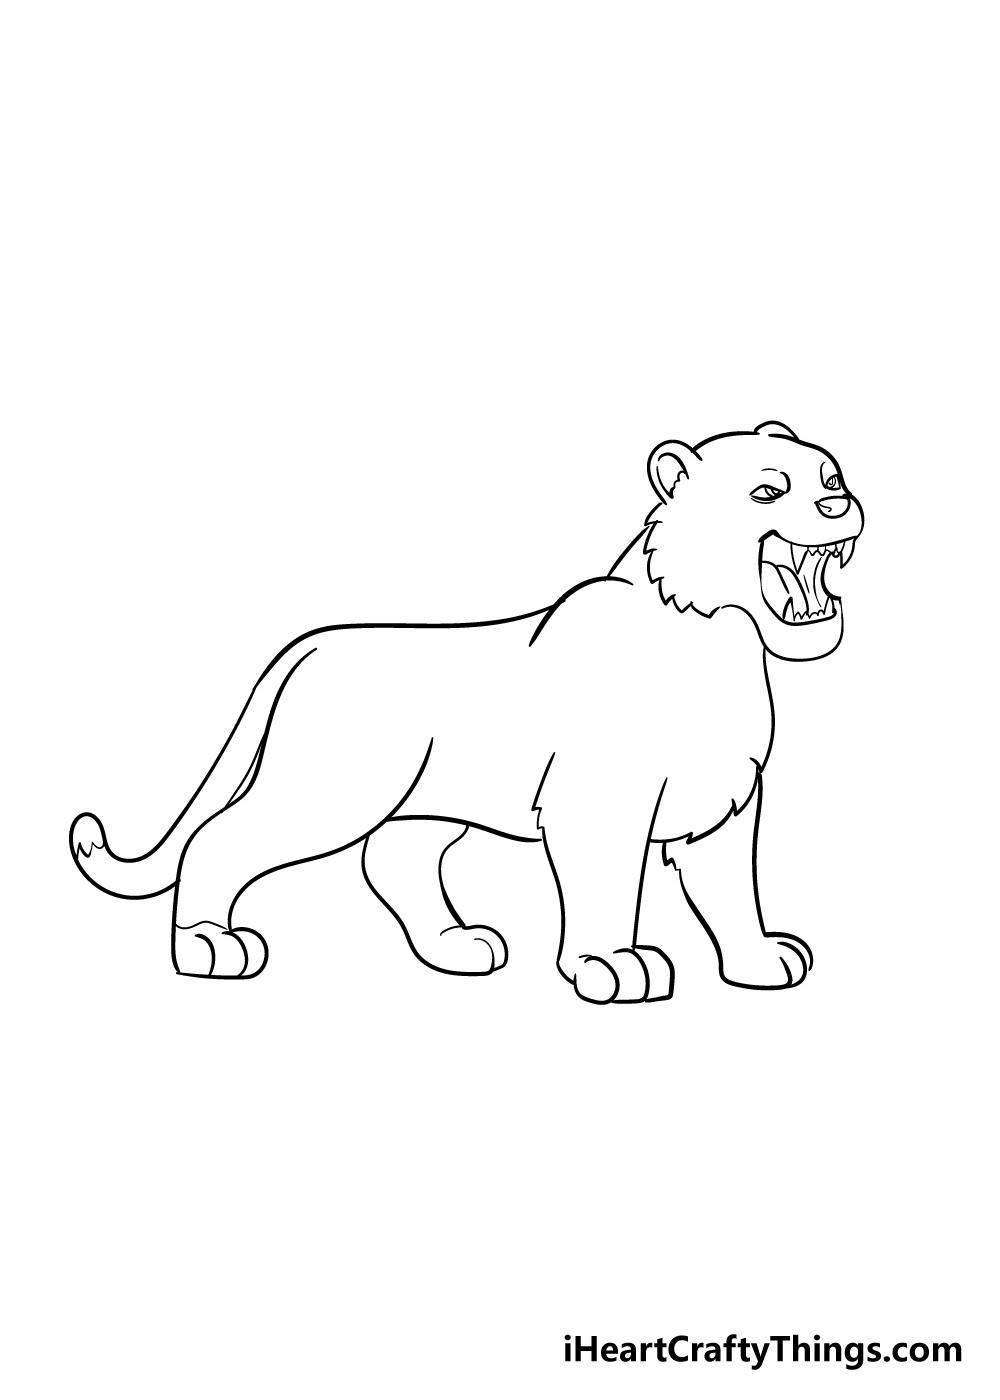 drawing tiger step 6